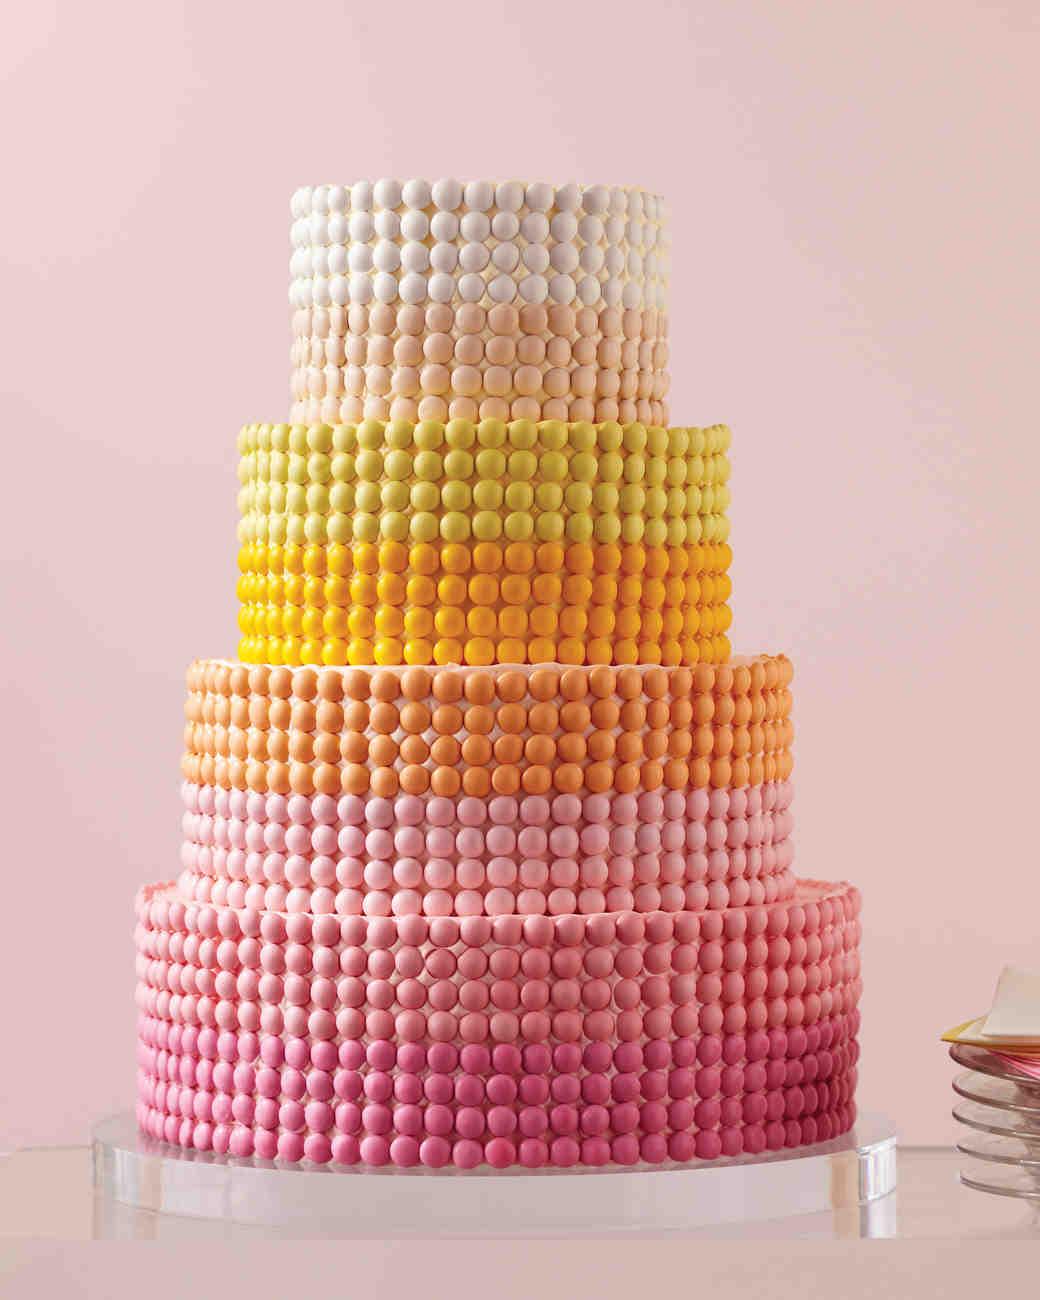 Cake Decorating Wedding Ideas: 9 Wedding-Worthy Cake-Decorating Ideas